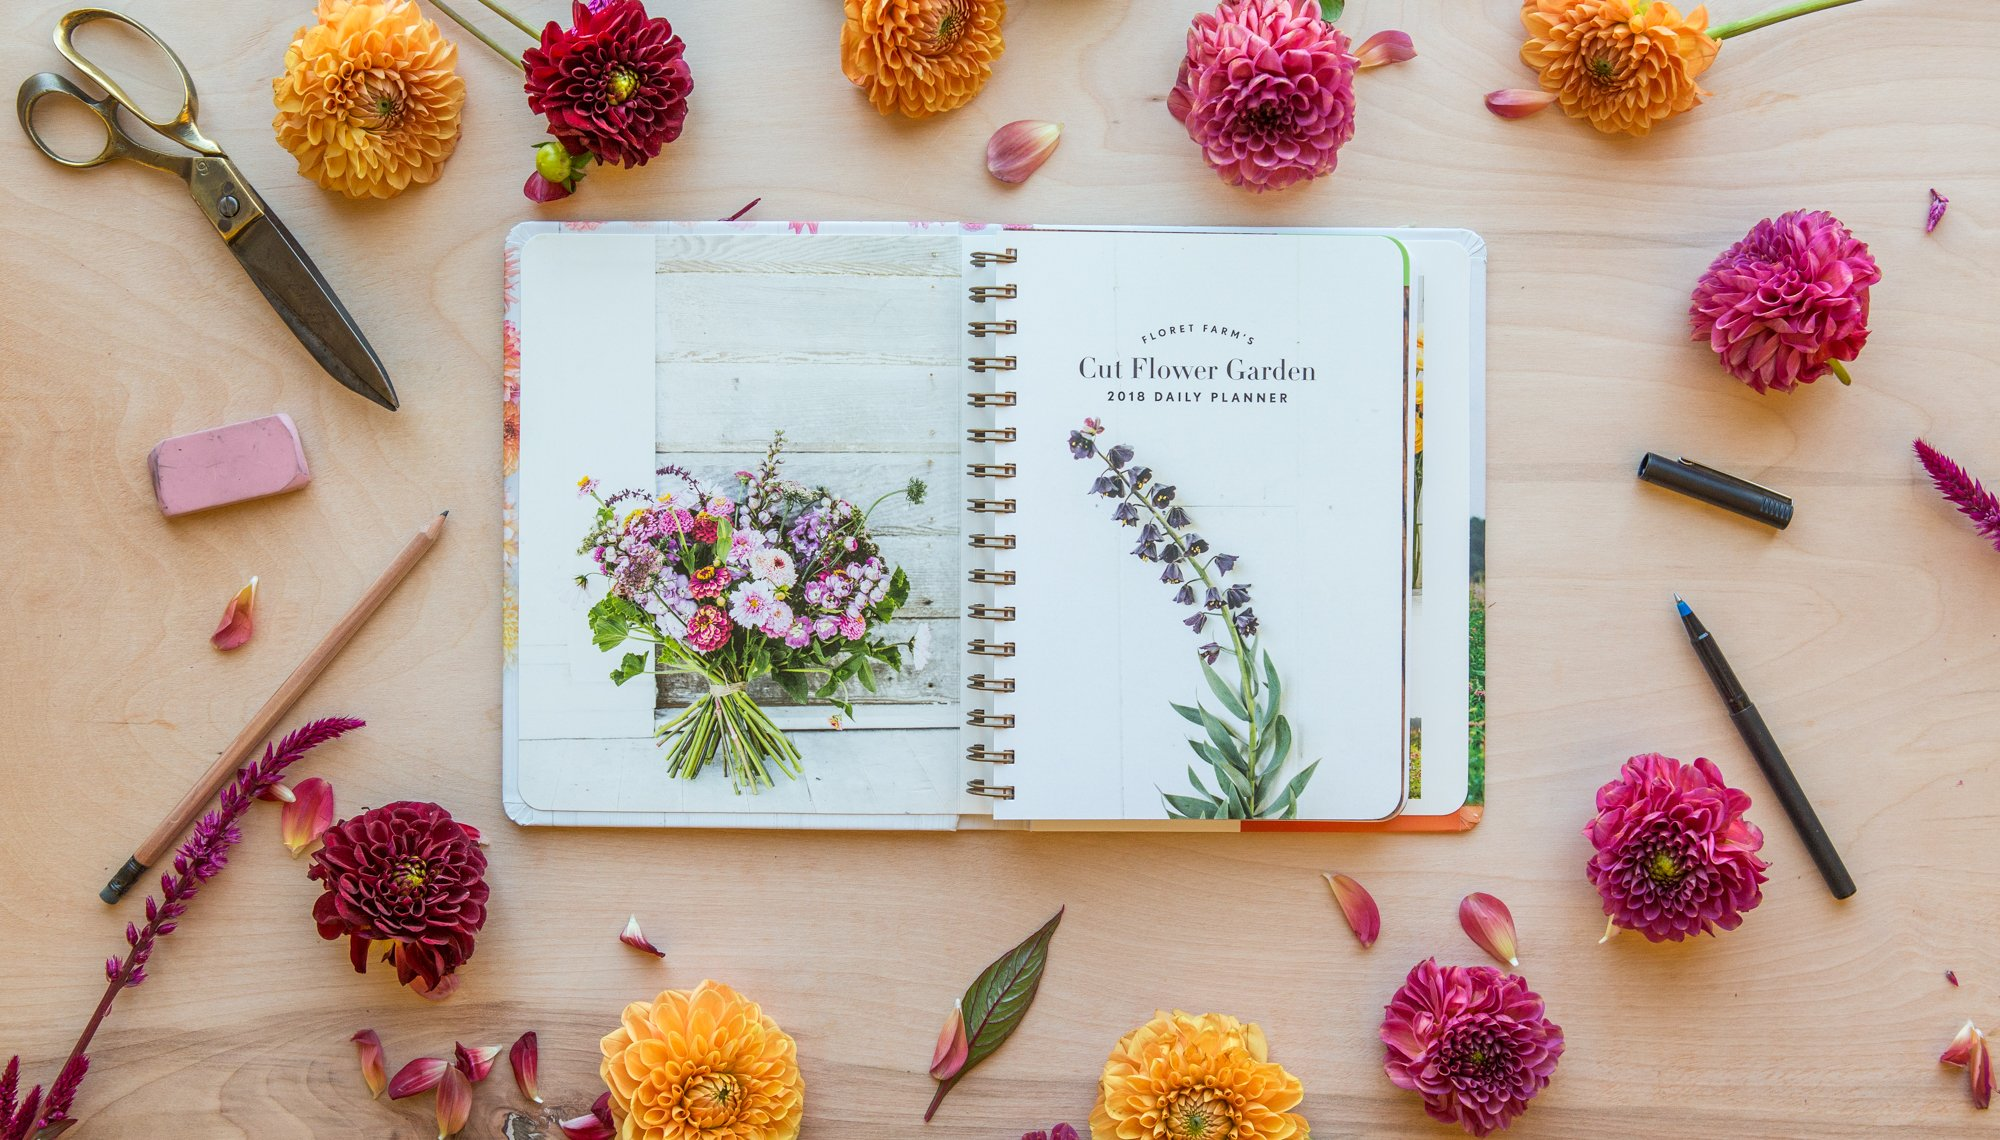 amazon floret farm s cut flower garden 2018 daily planner daily